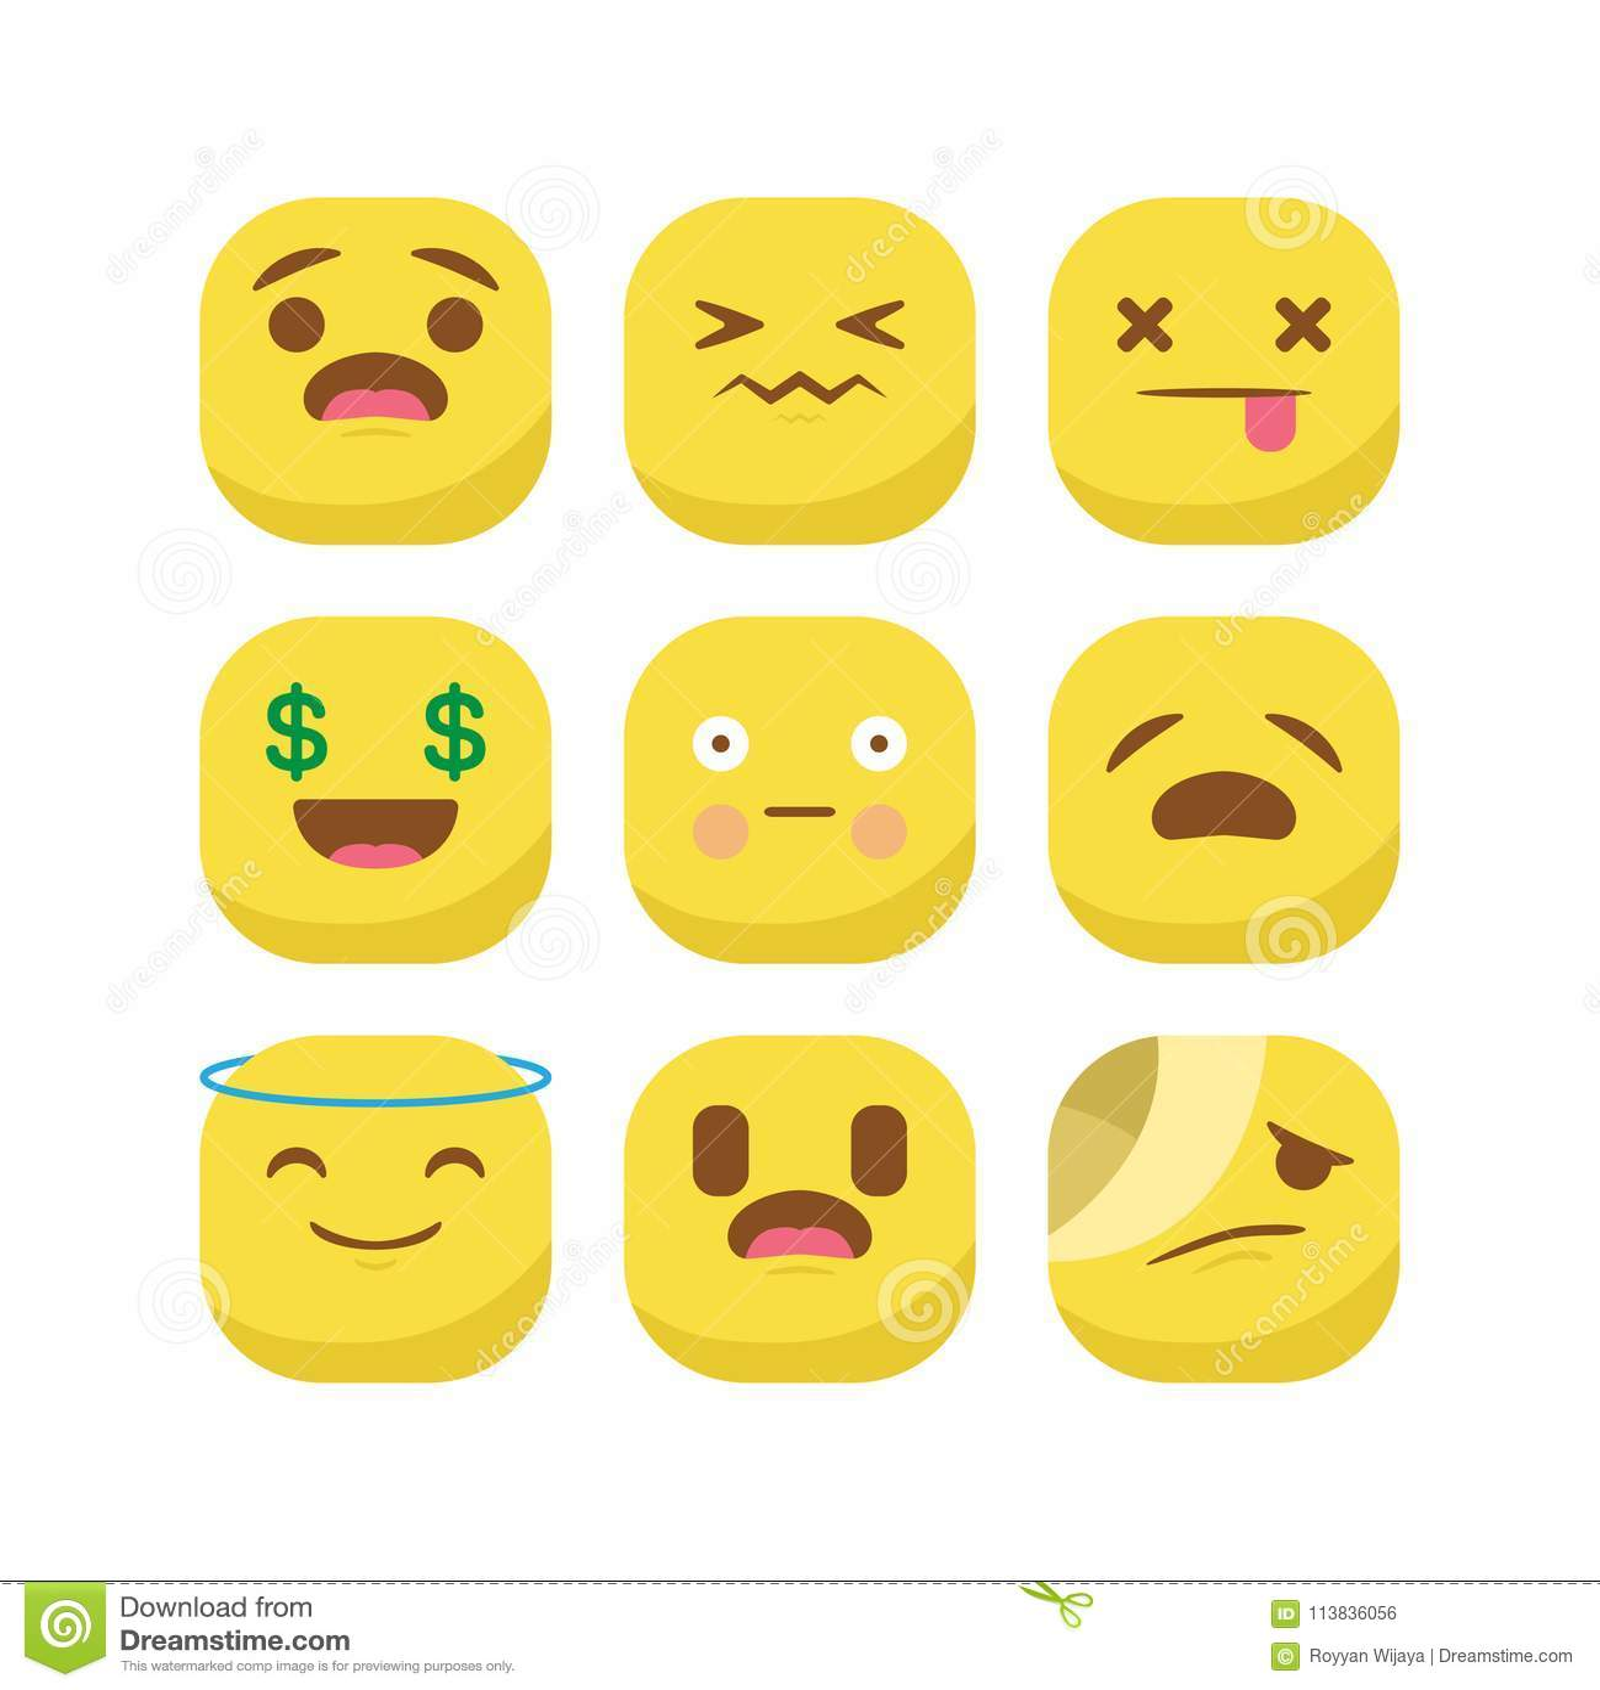 Cute emoji emoticon reaction expression smiley set vector isolated